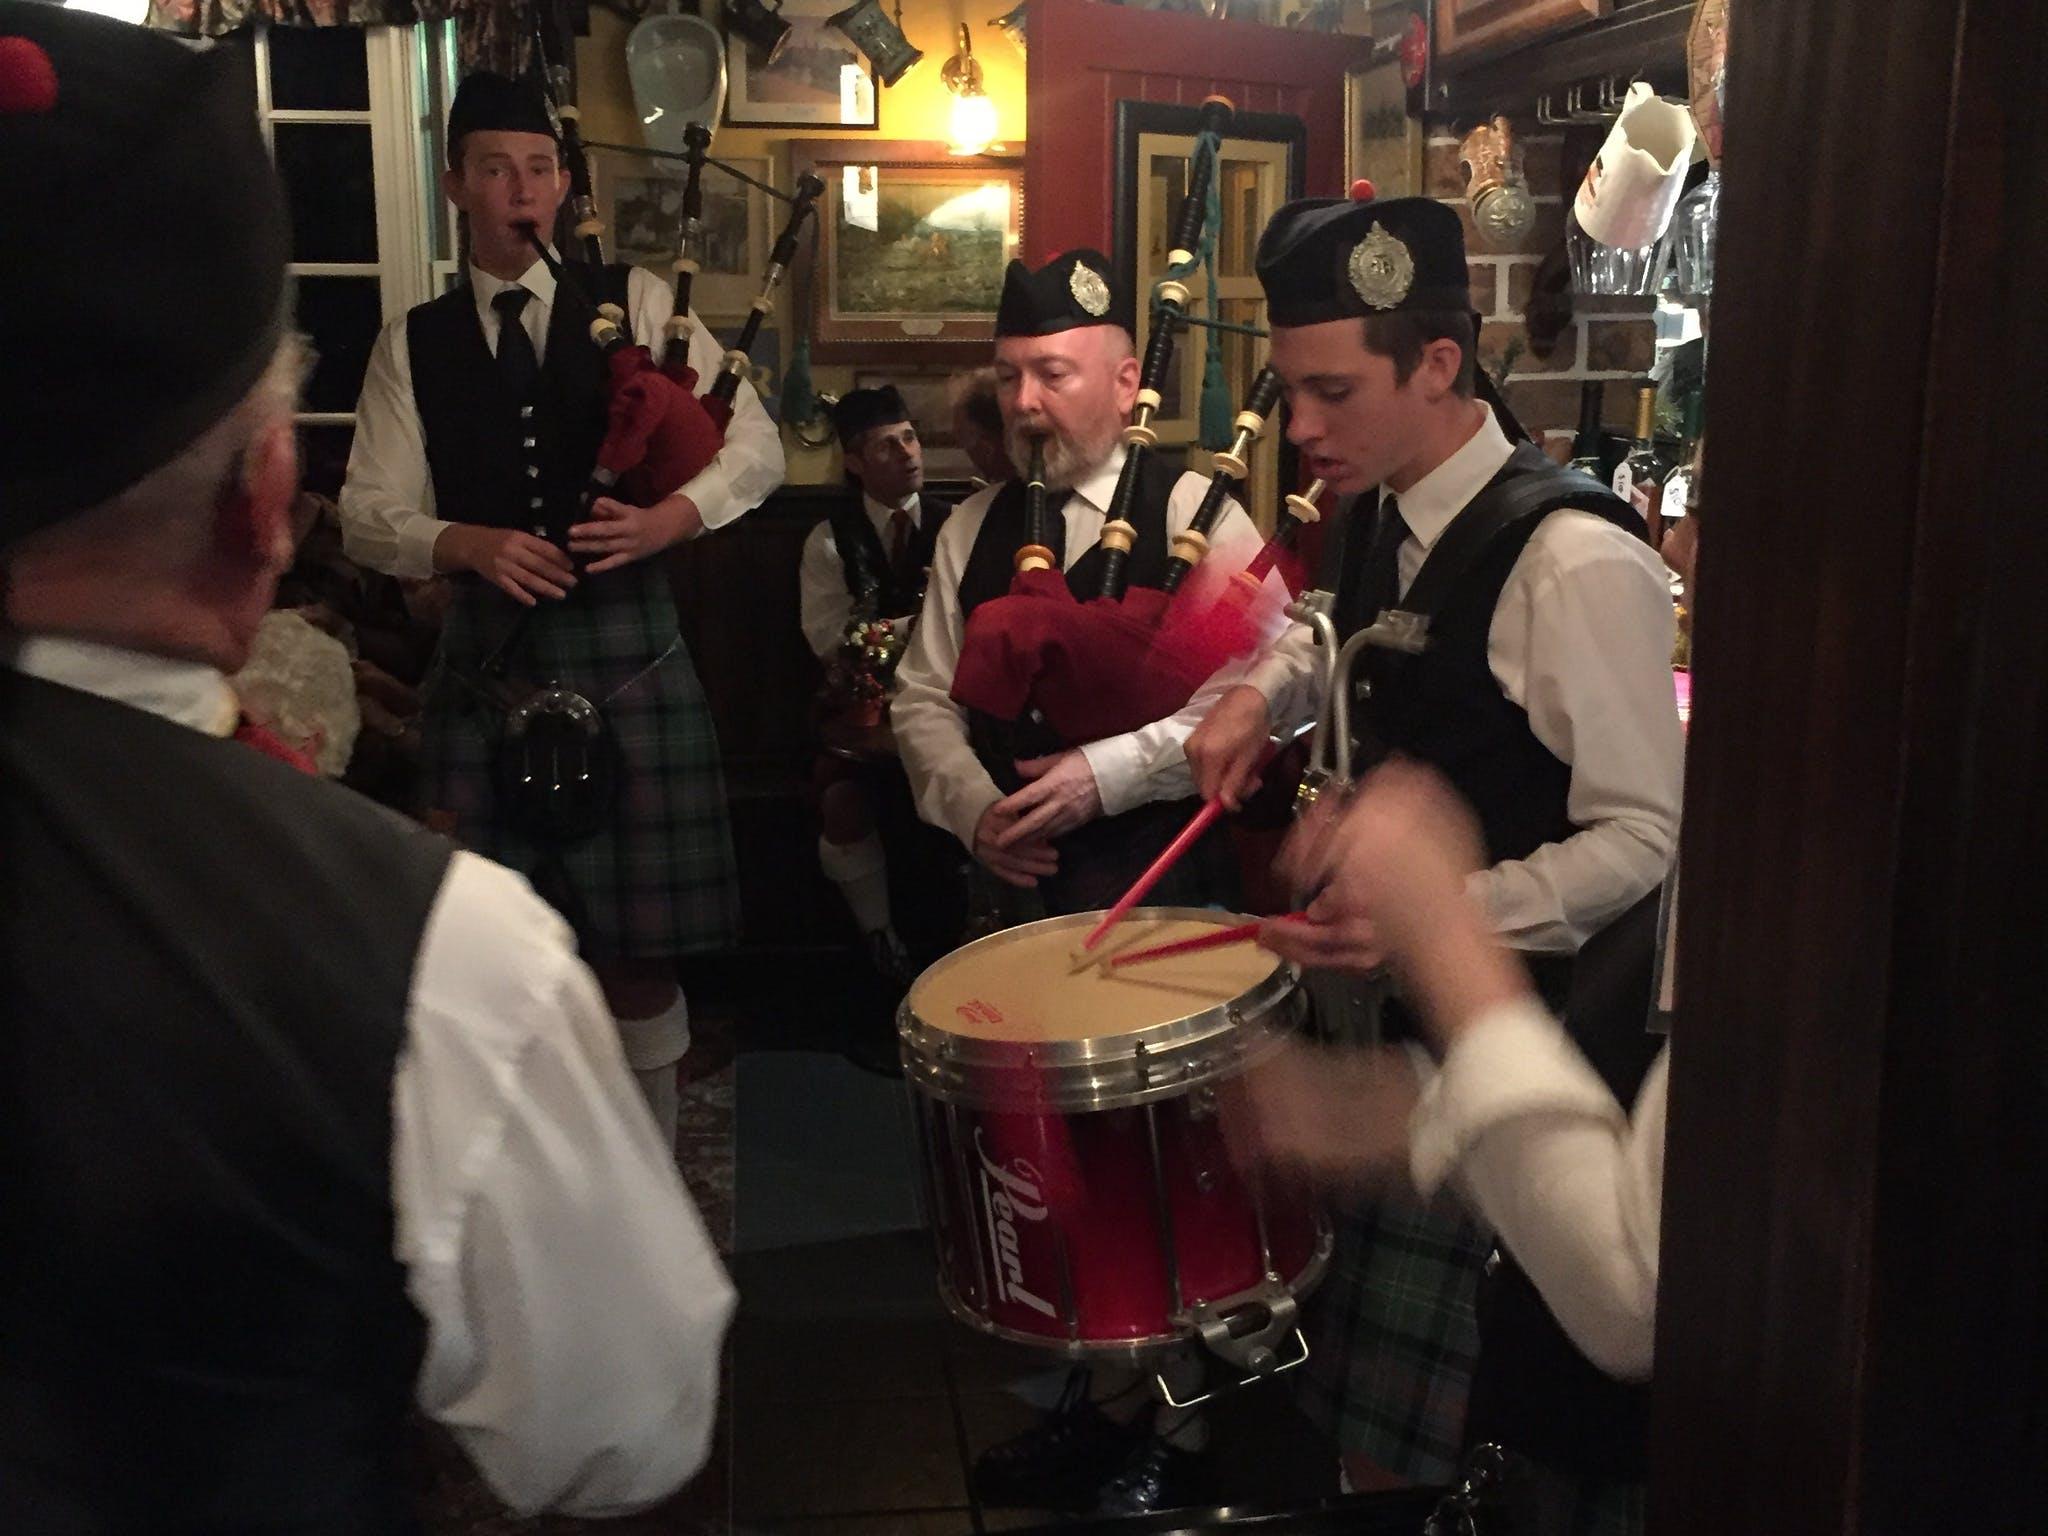 Scotland The Brave Pipe Celebration Dinner